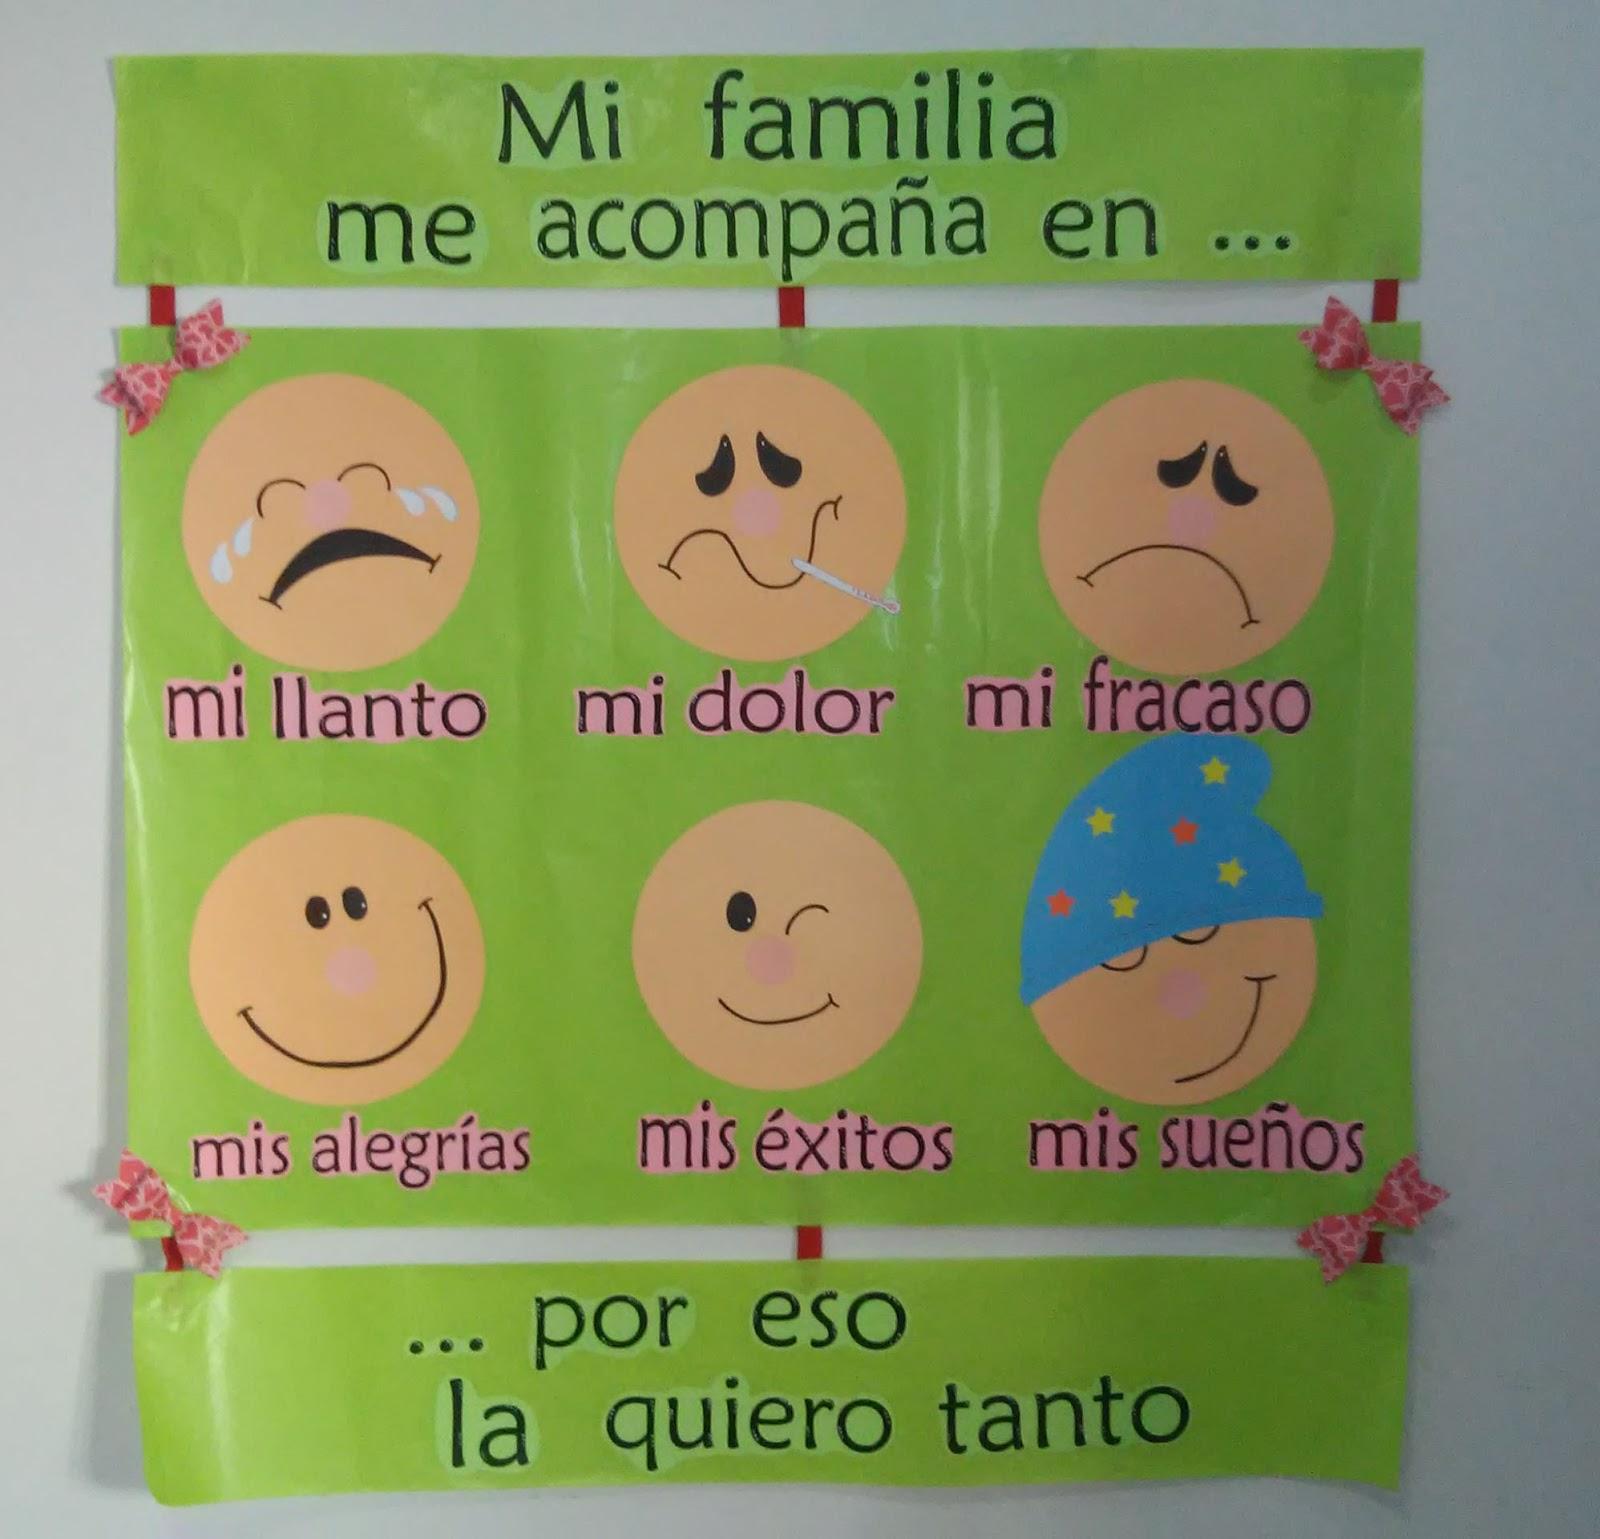 Cartelera Sobre La Familia El Abrazo En Familia